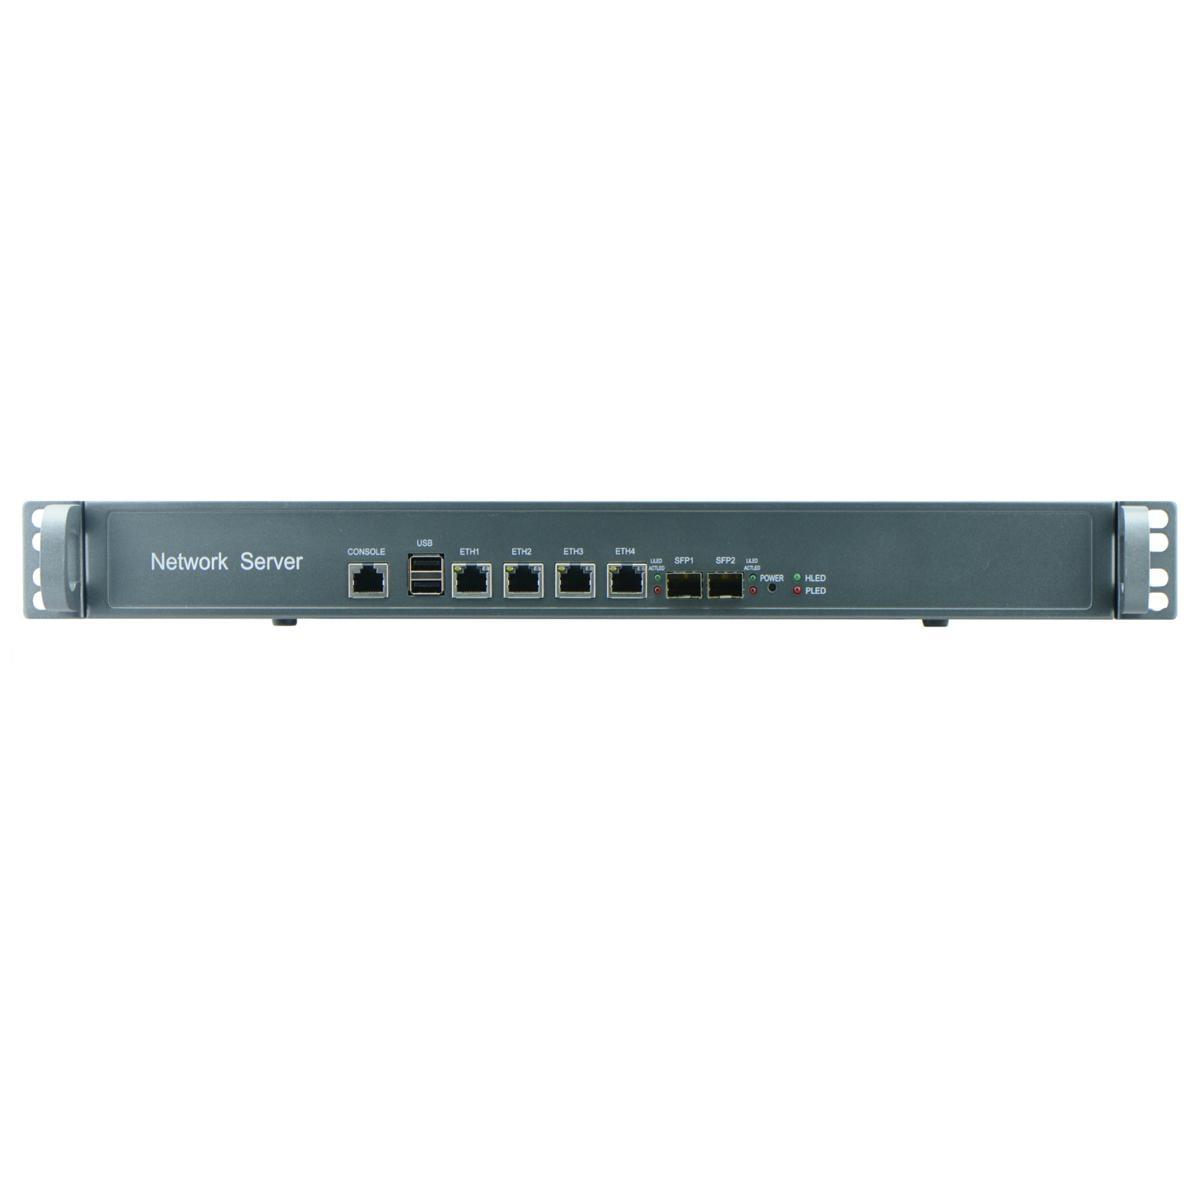 Intel Celeron C1037U 1U Rackmount Barebone for Network Security Application with 1